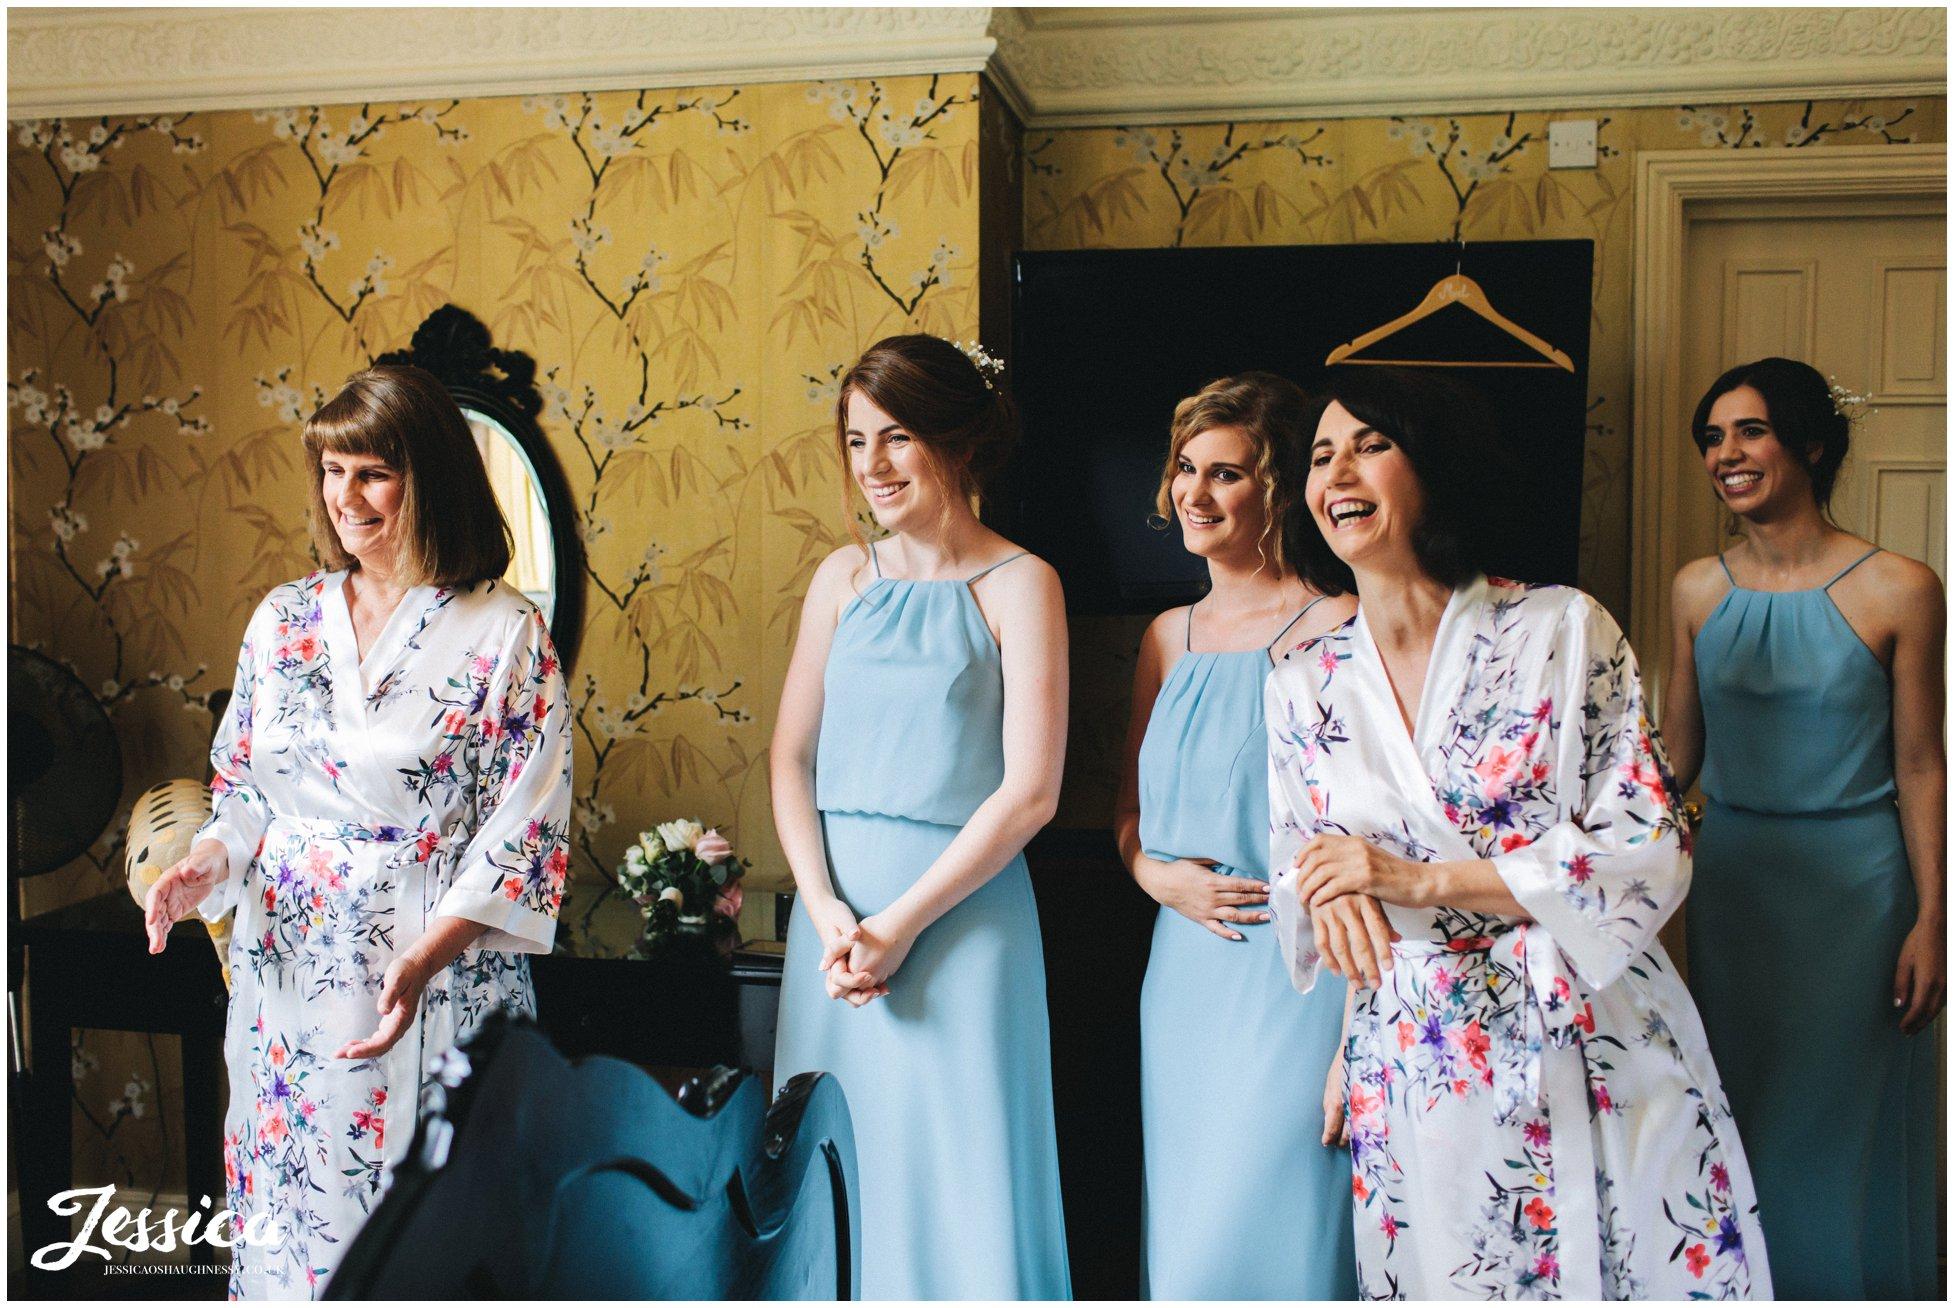 the bridesmaids admire their friend in her wedding dress